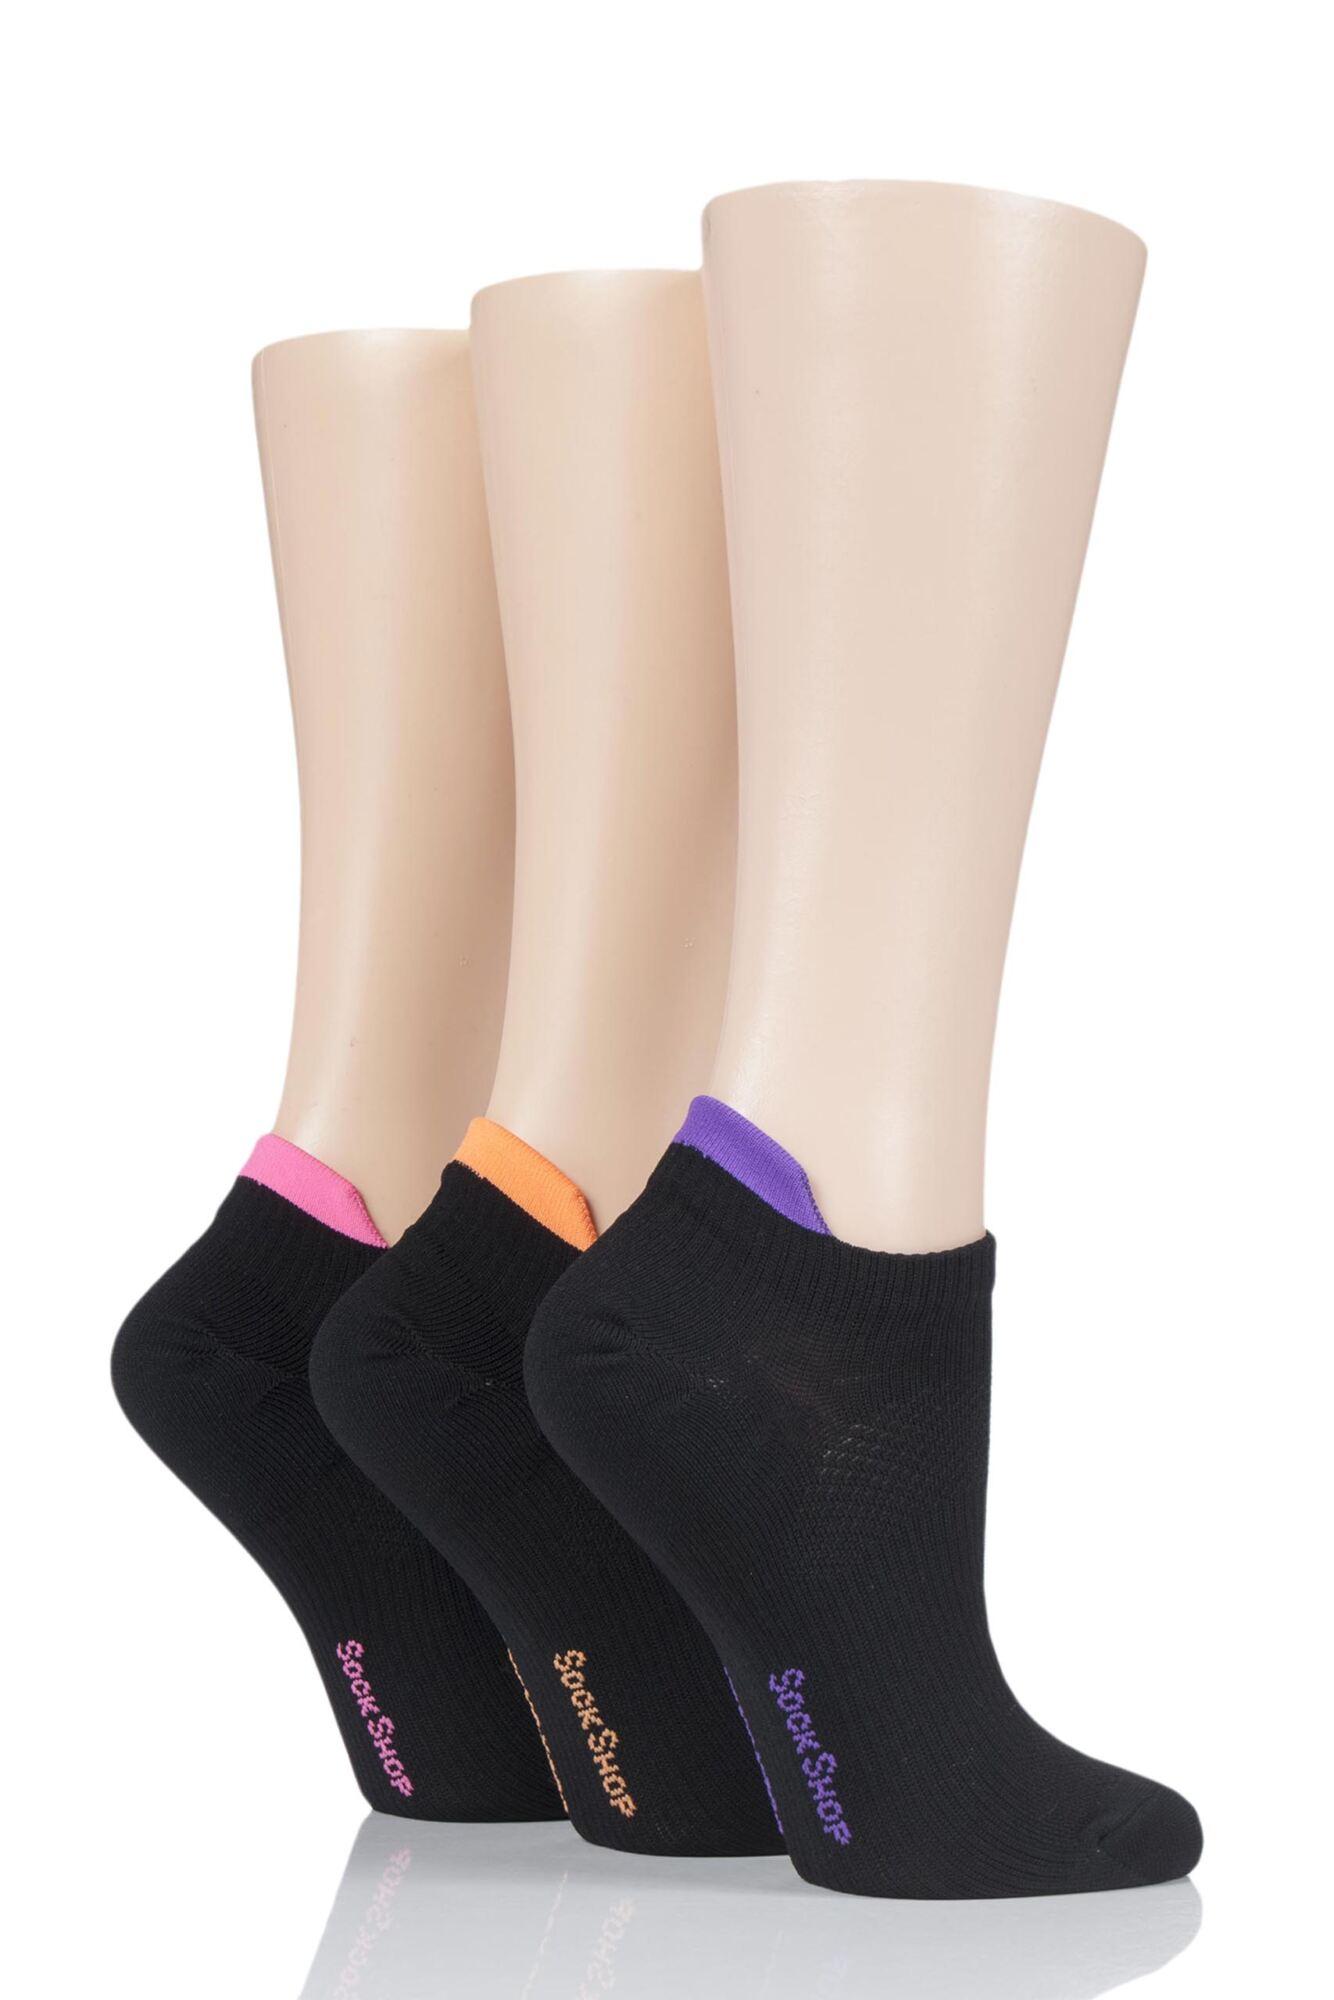 3 Pair Poly Sports No Show Socks Ladies - SOCKSHOP